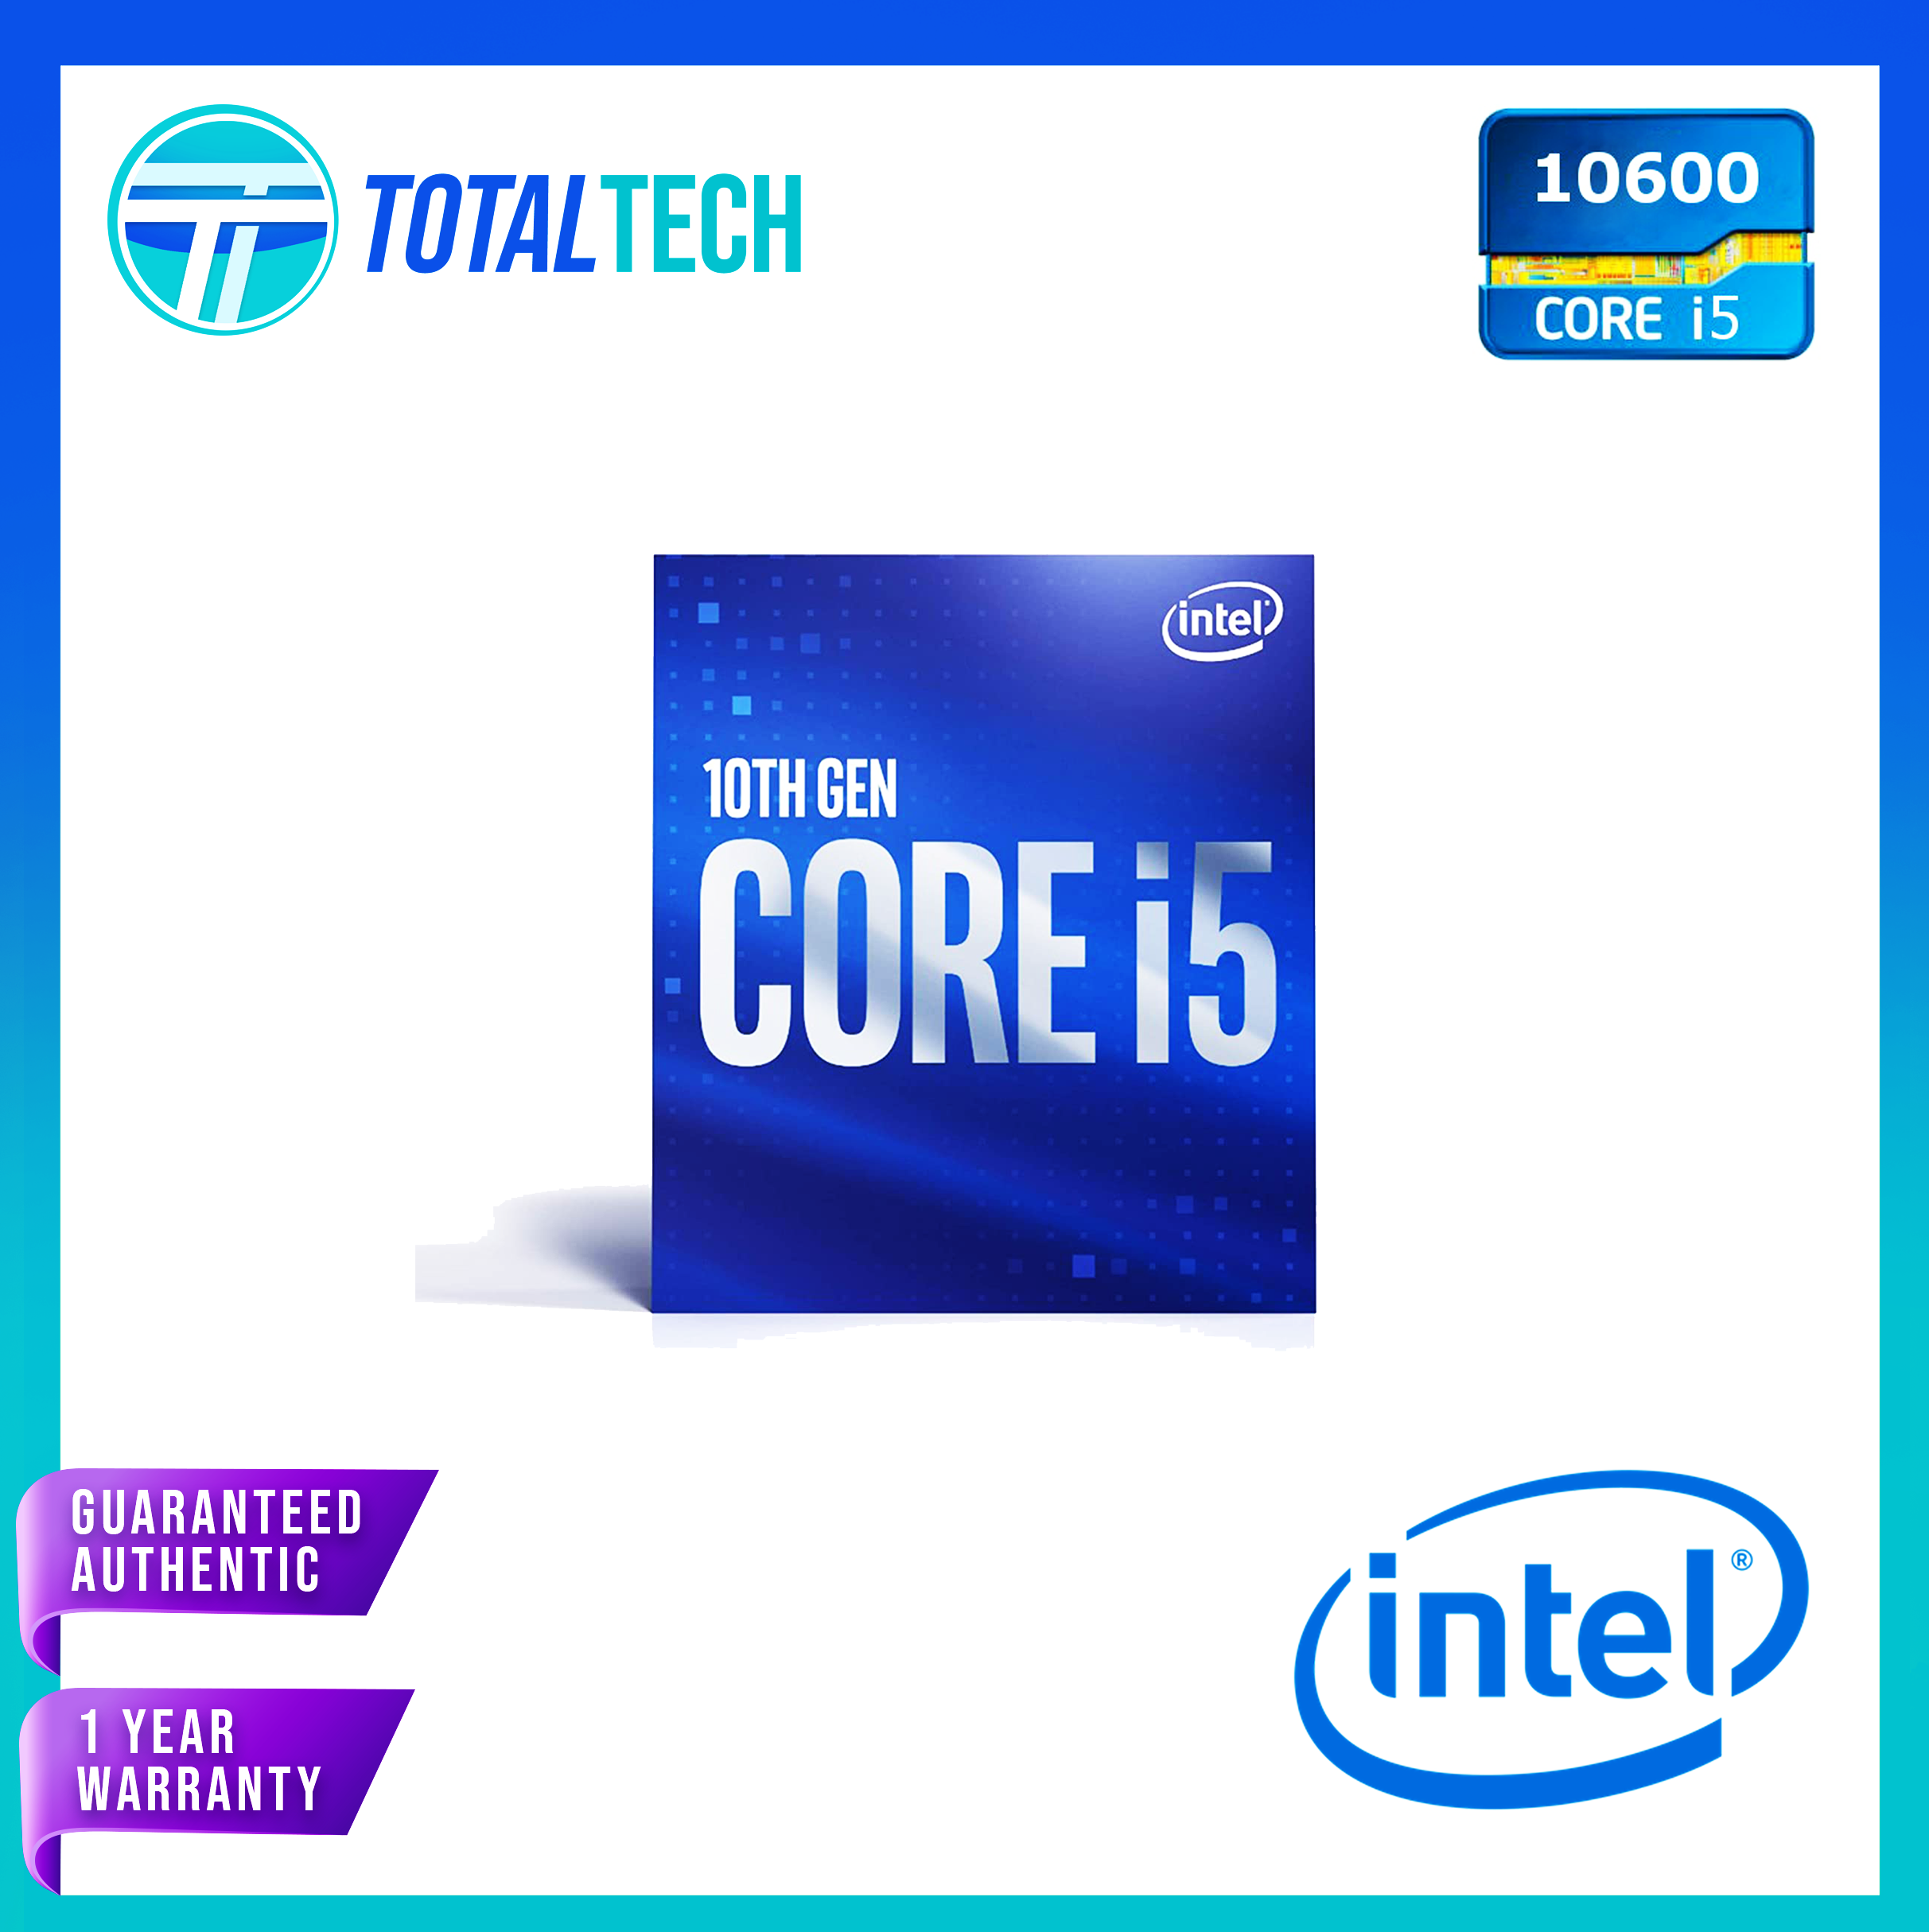 Intel 400 Series chipset 65W Intel Core i5-10600 Desktop Processor 6 Cores up to 4.8 GHz LGA1200